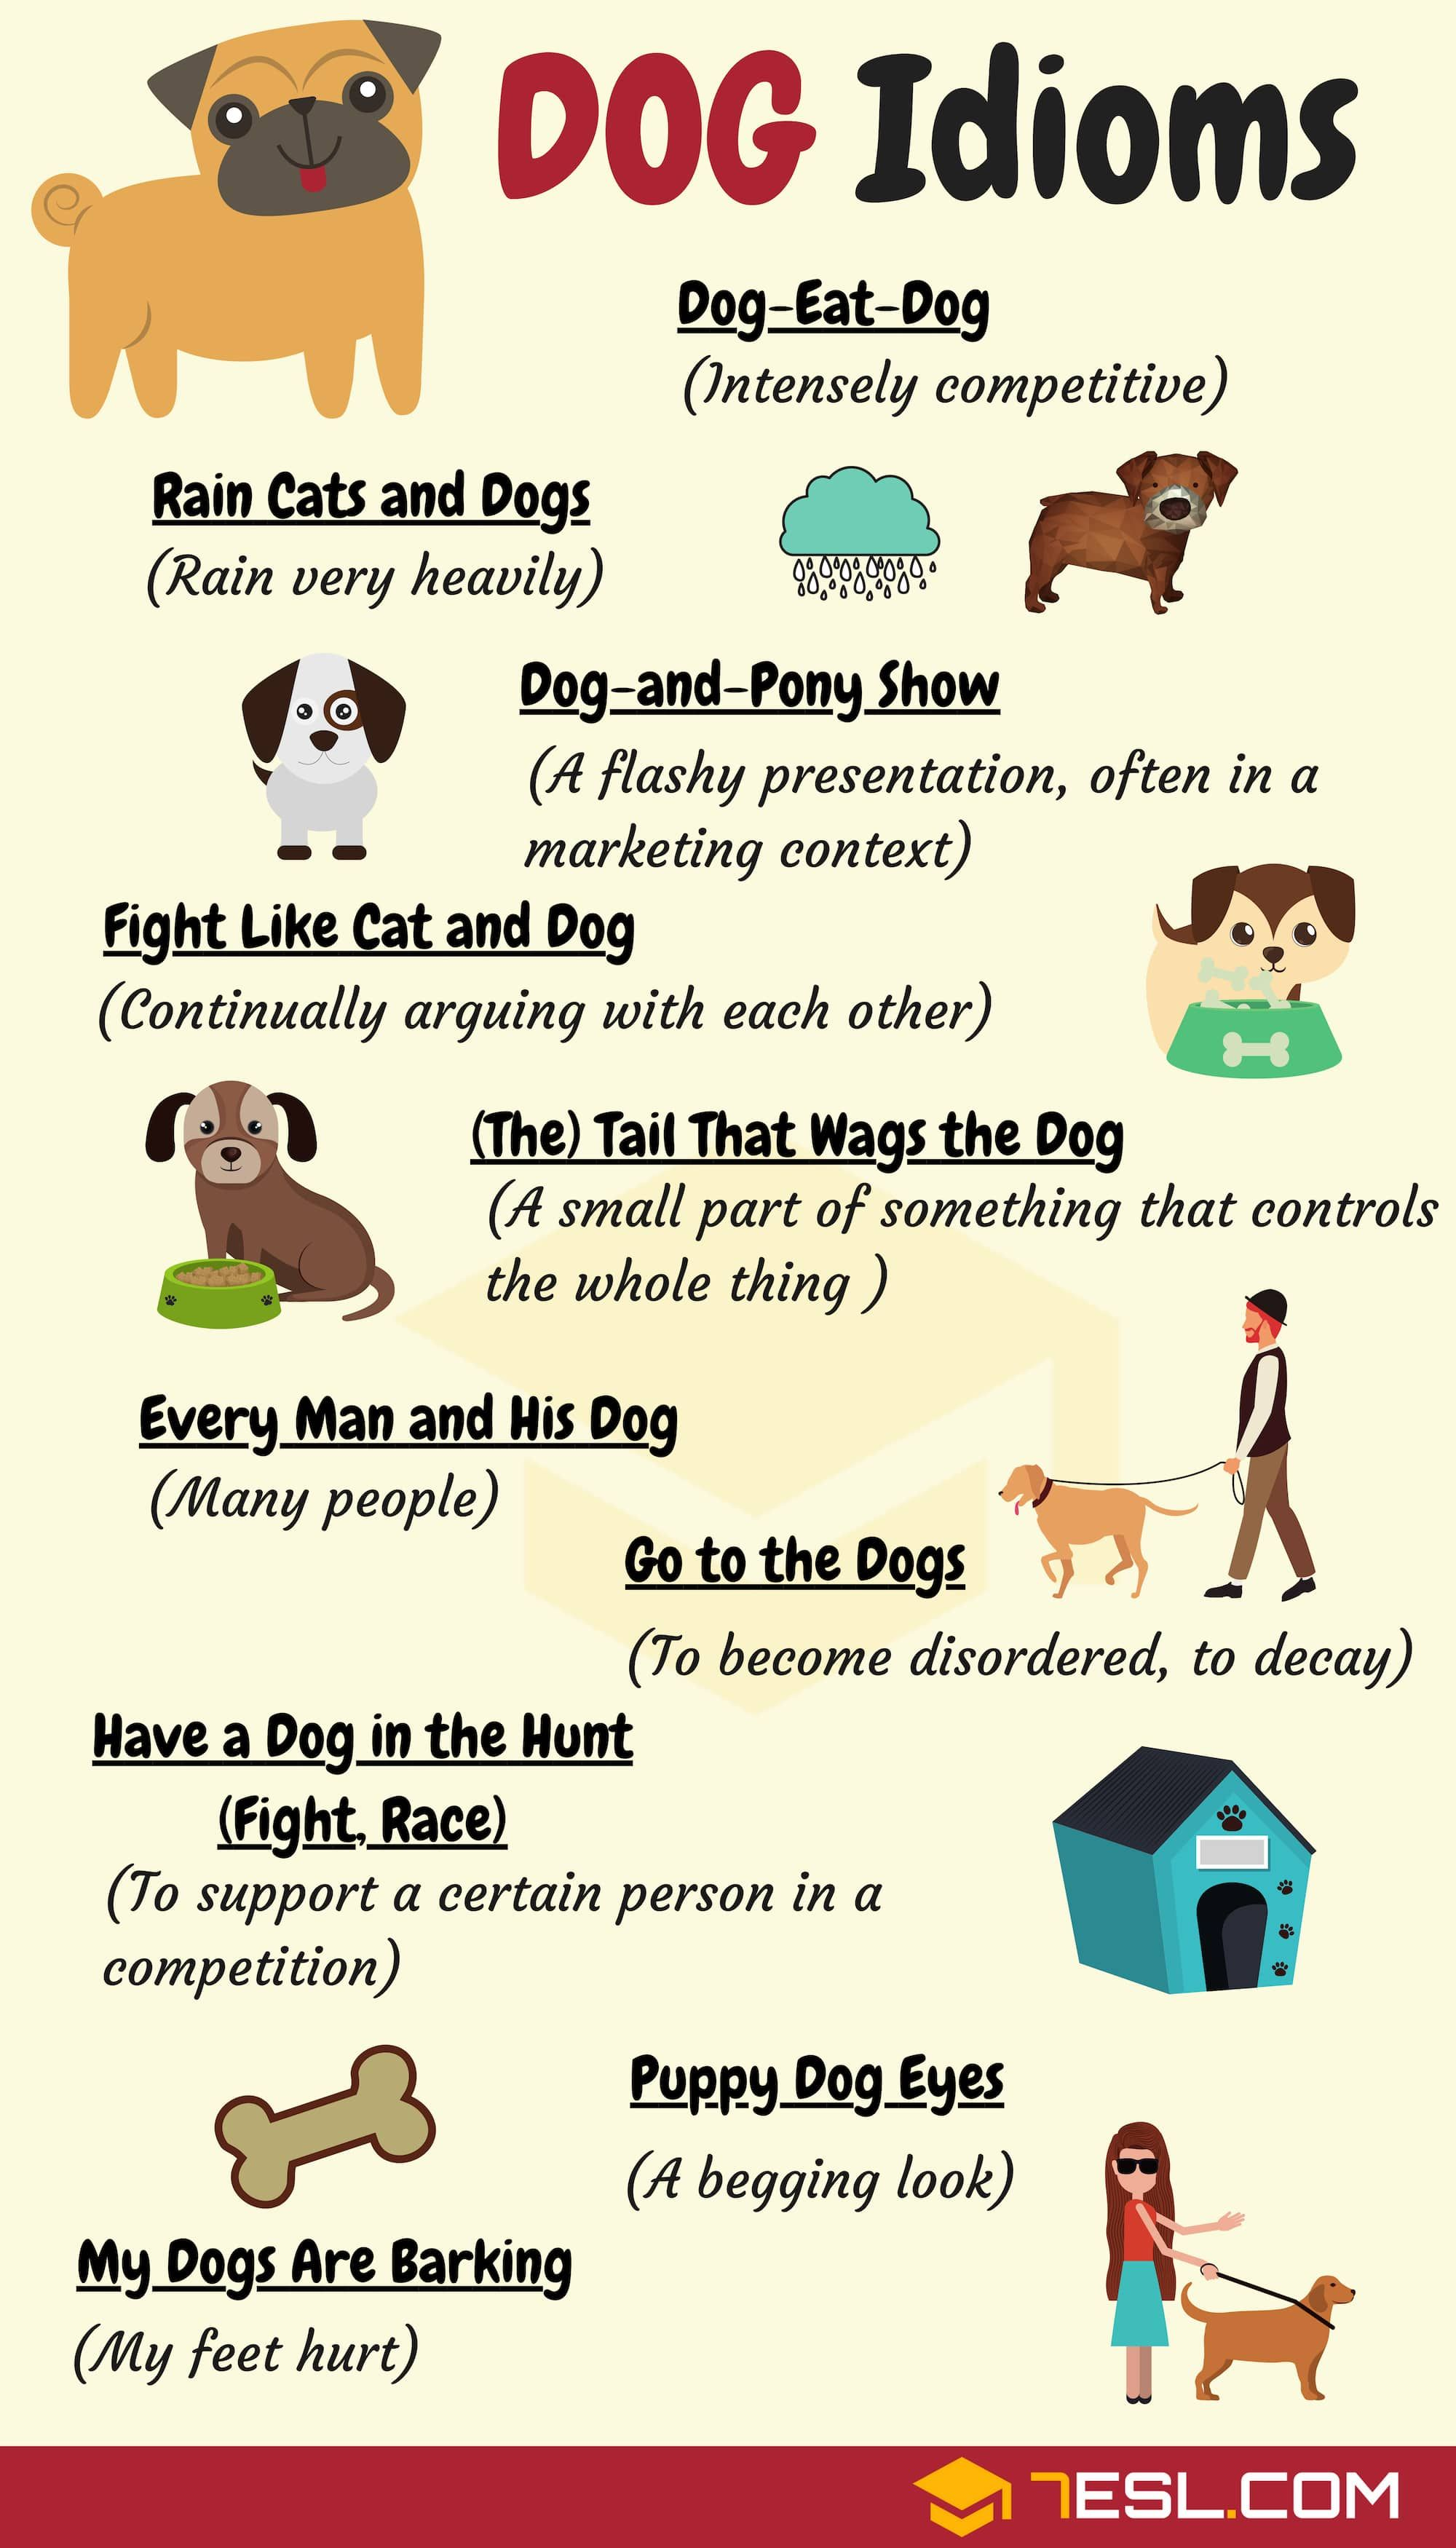 Dog Idioms 16 Useful Dog Idioms And Sayings